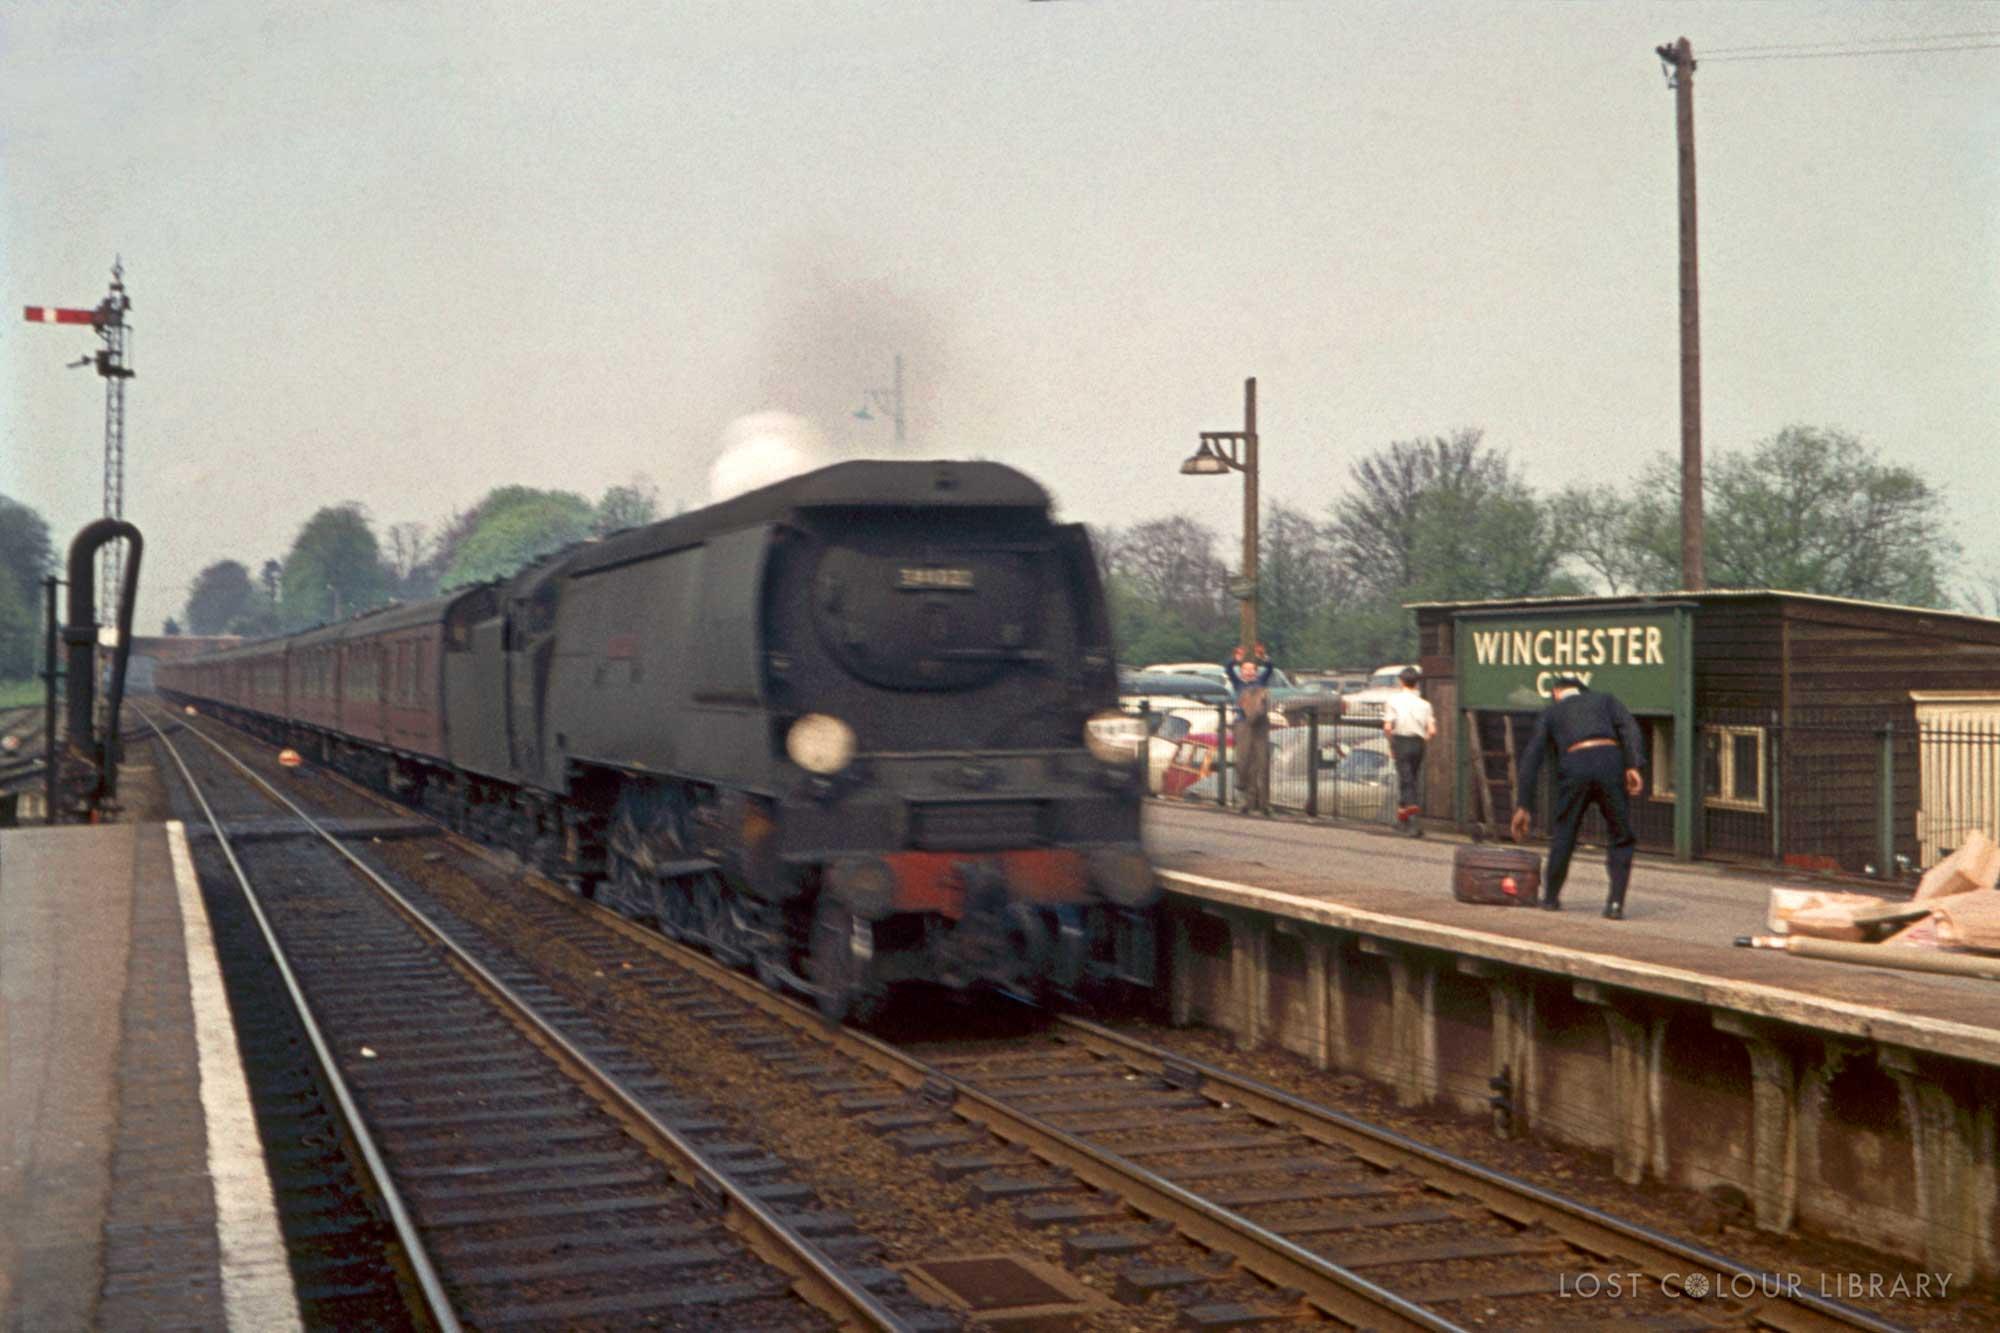 lcl-ww-winchester-train-1960s-site-wm.jpg